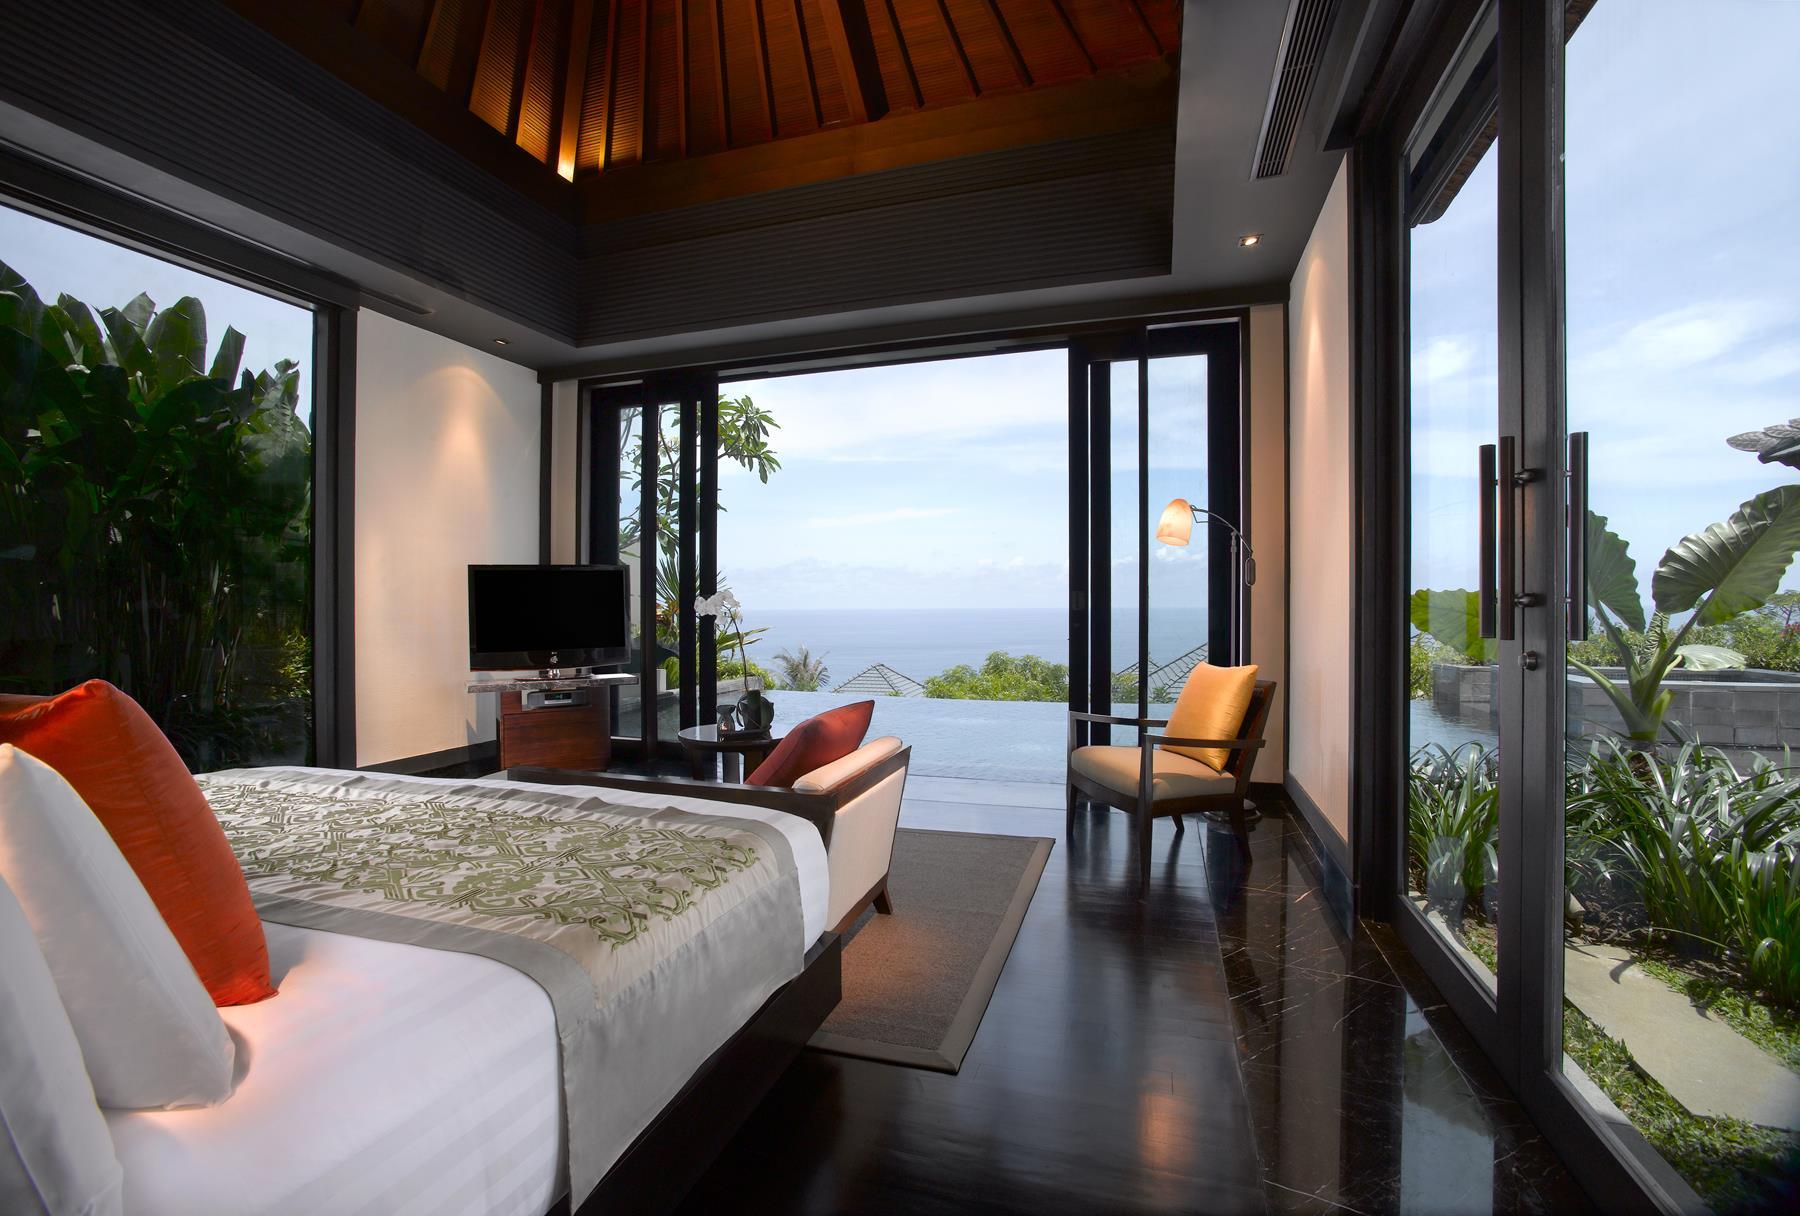 Banyan Tree Ungasan Bali Angebote Buchen Dsi Reisen